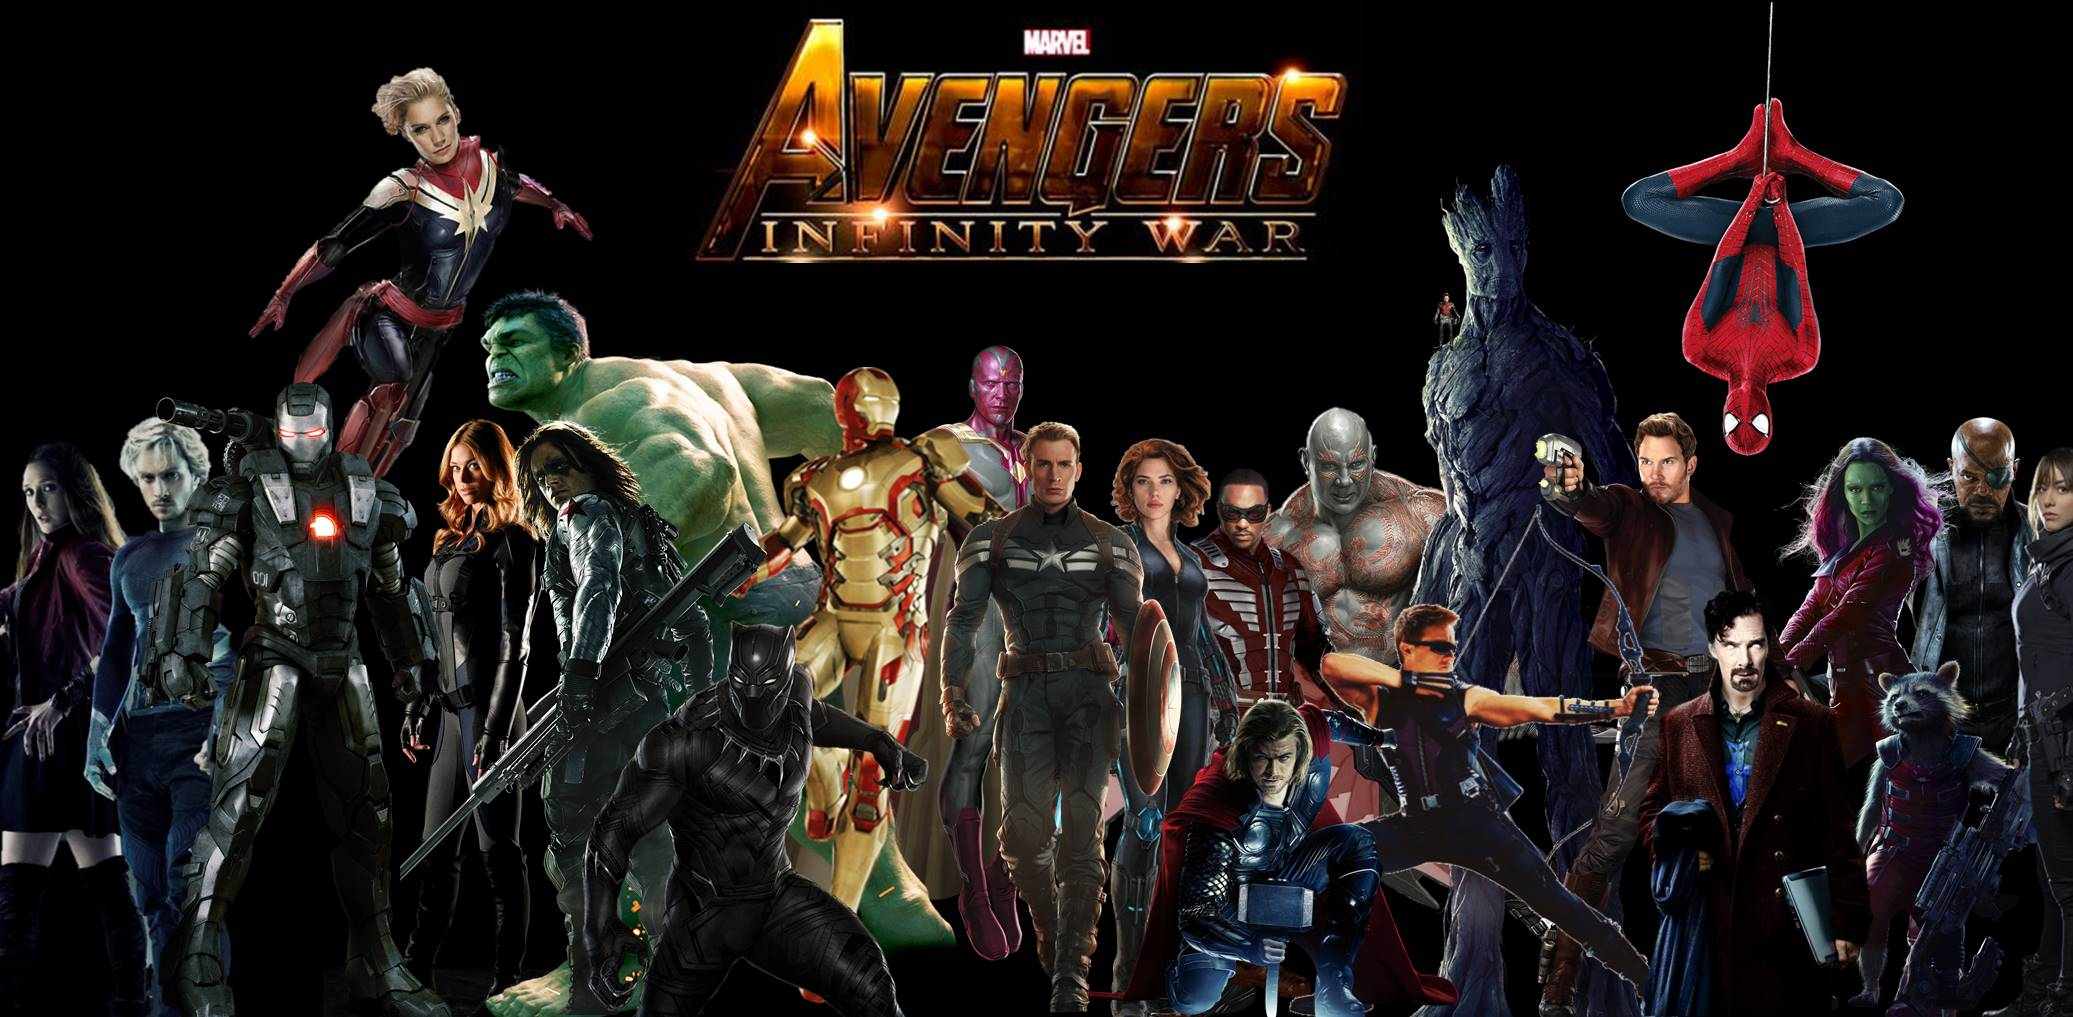 Se filtra tráiler de 'Avengers: Infinity War'   El Imparcial de Oaxaca